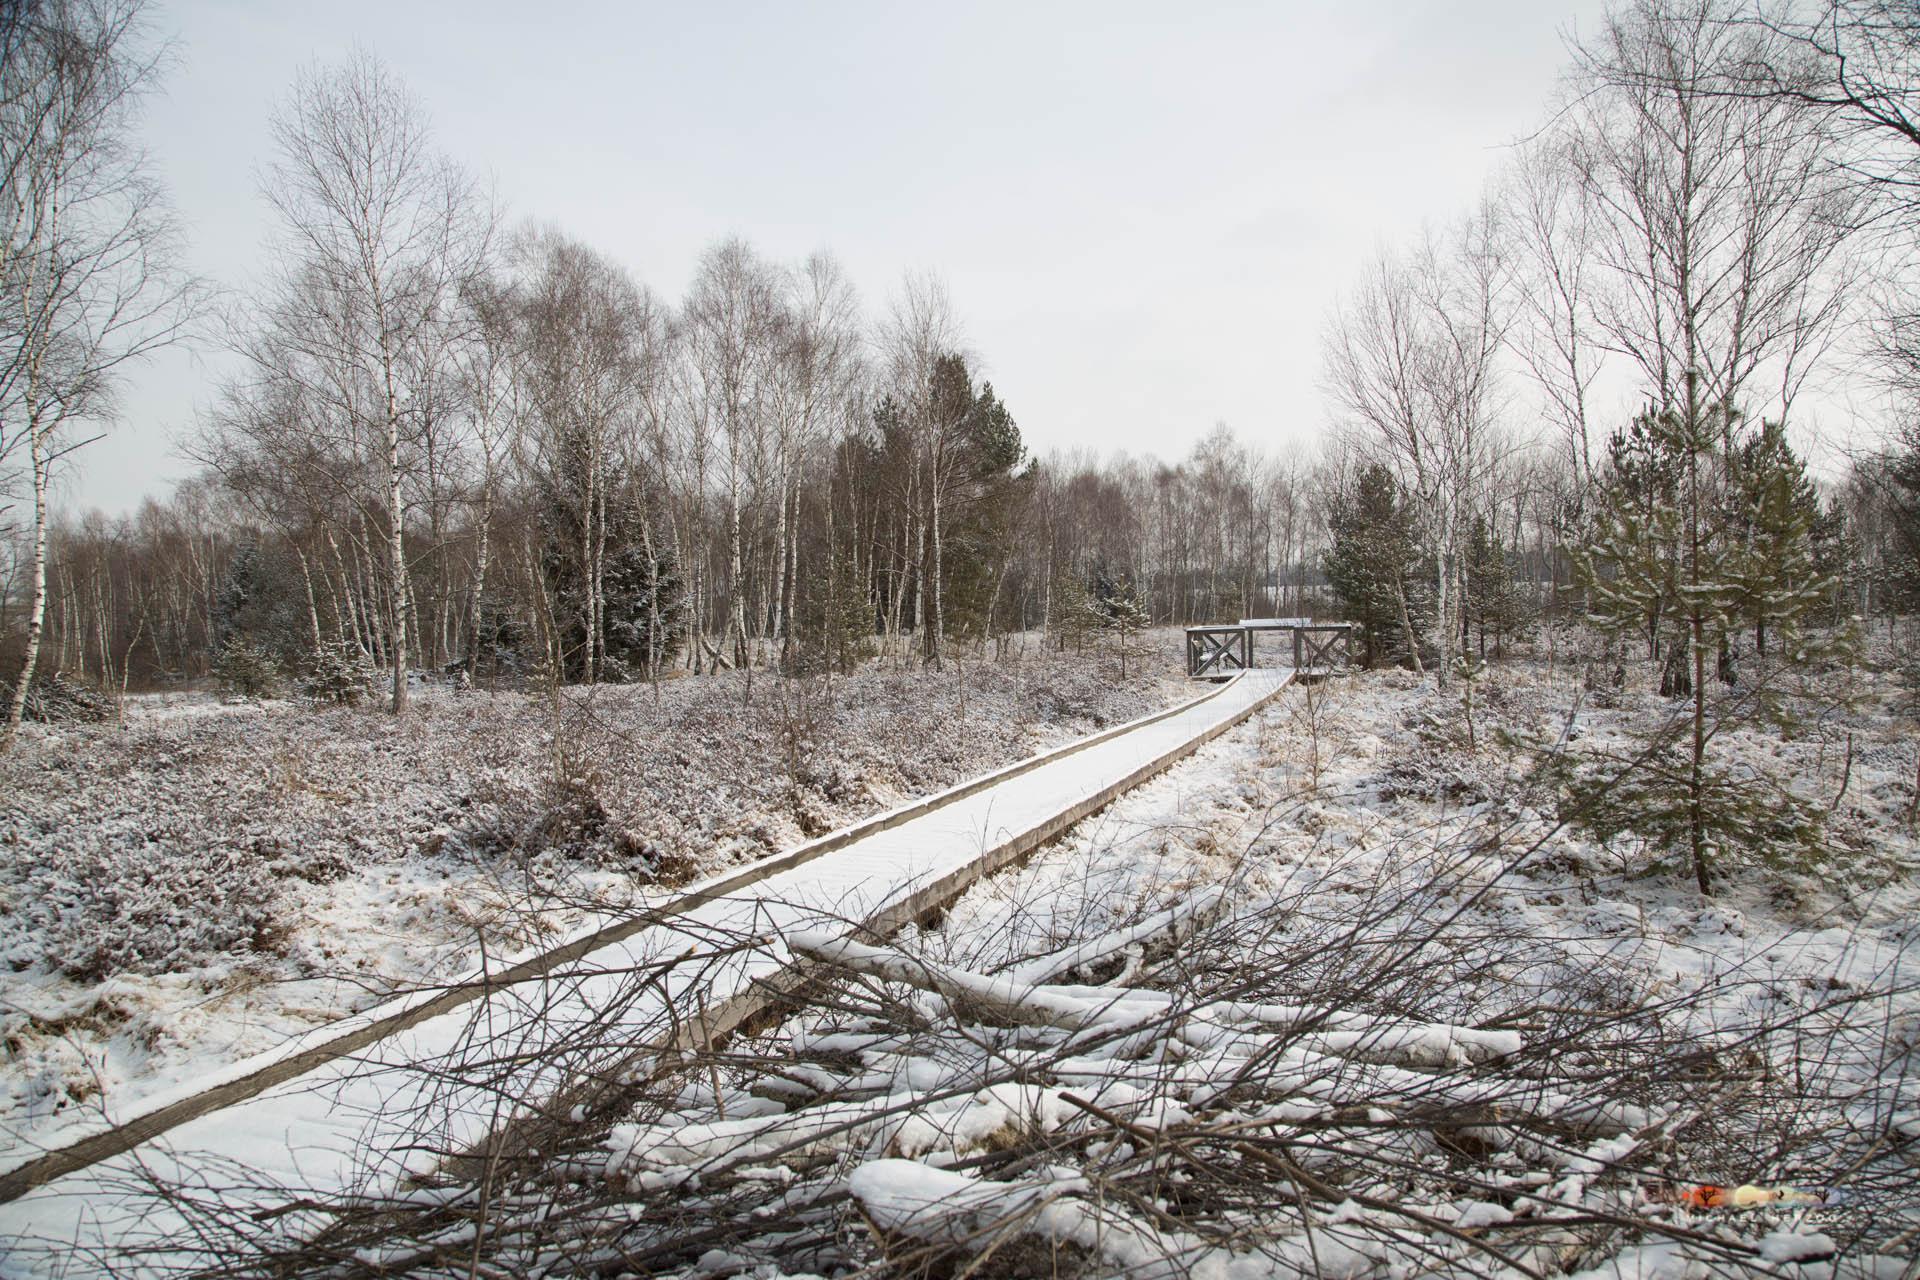 Weidmoos_SibirischeKälte_Frühling2018_MichaelHerzog-2164.jpg